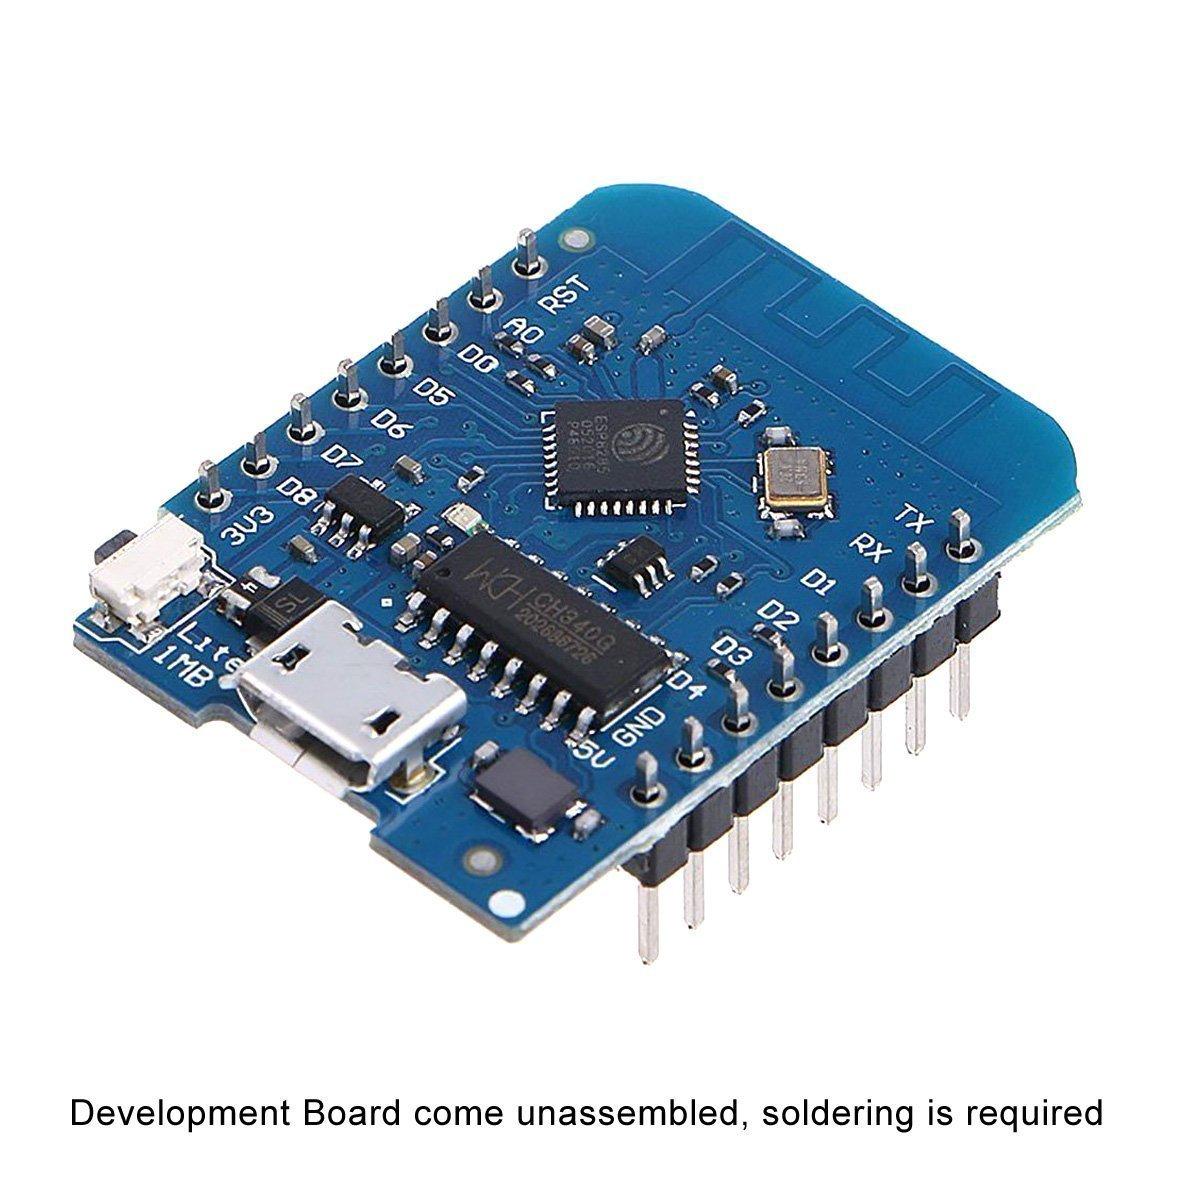 Wemos D1 Mini ESP8285 V1.0.0 1MB Flash Lite Wireless WiFi Internet Development Board